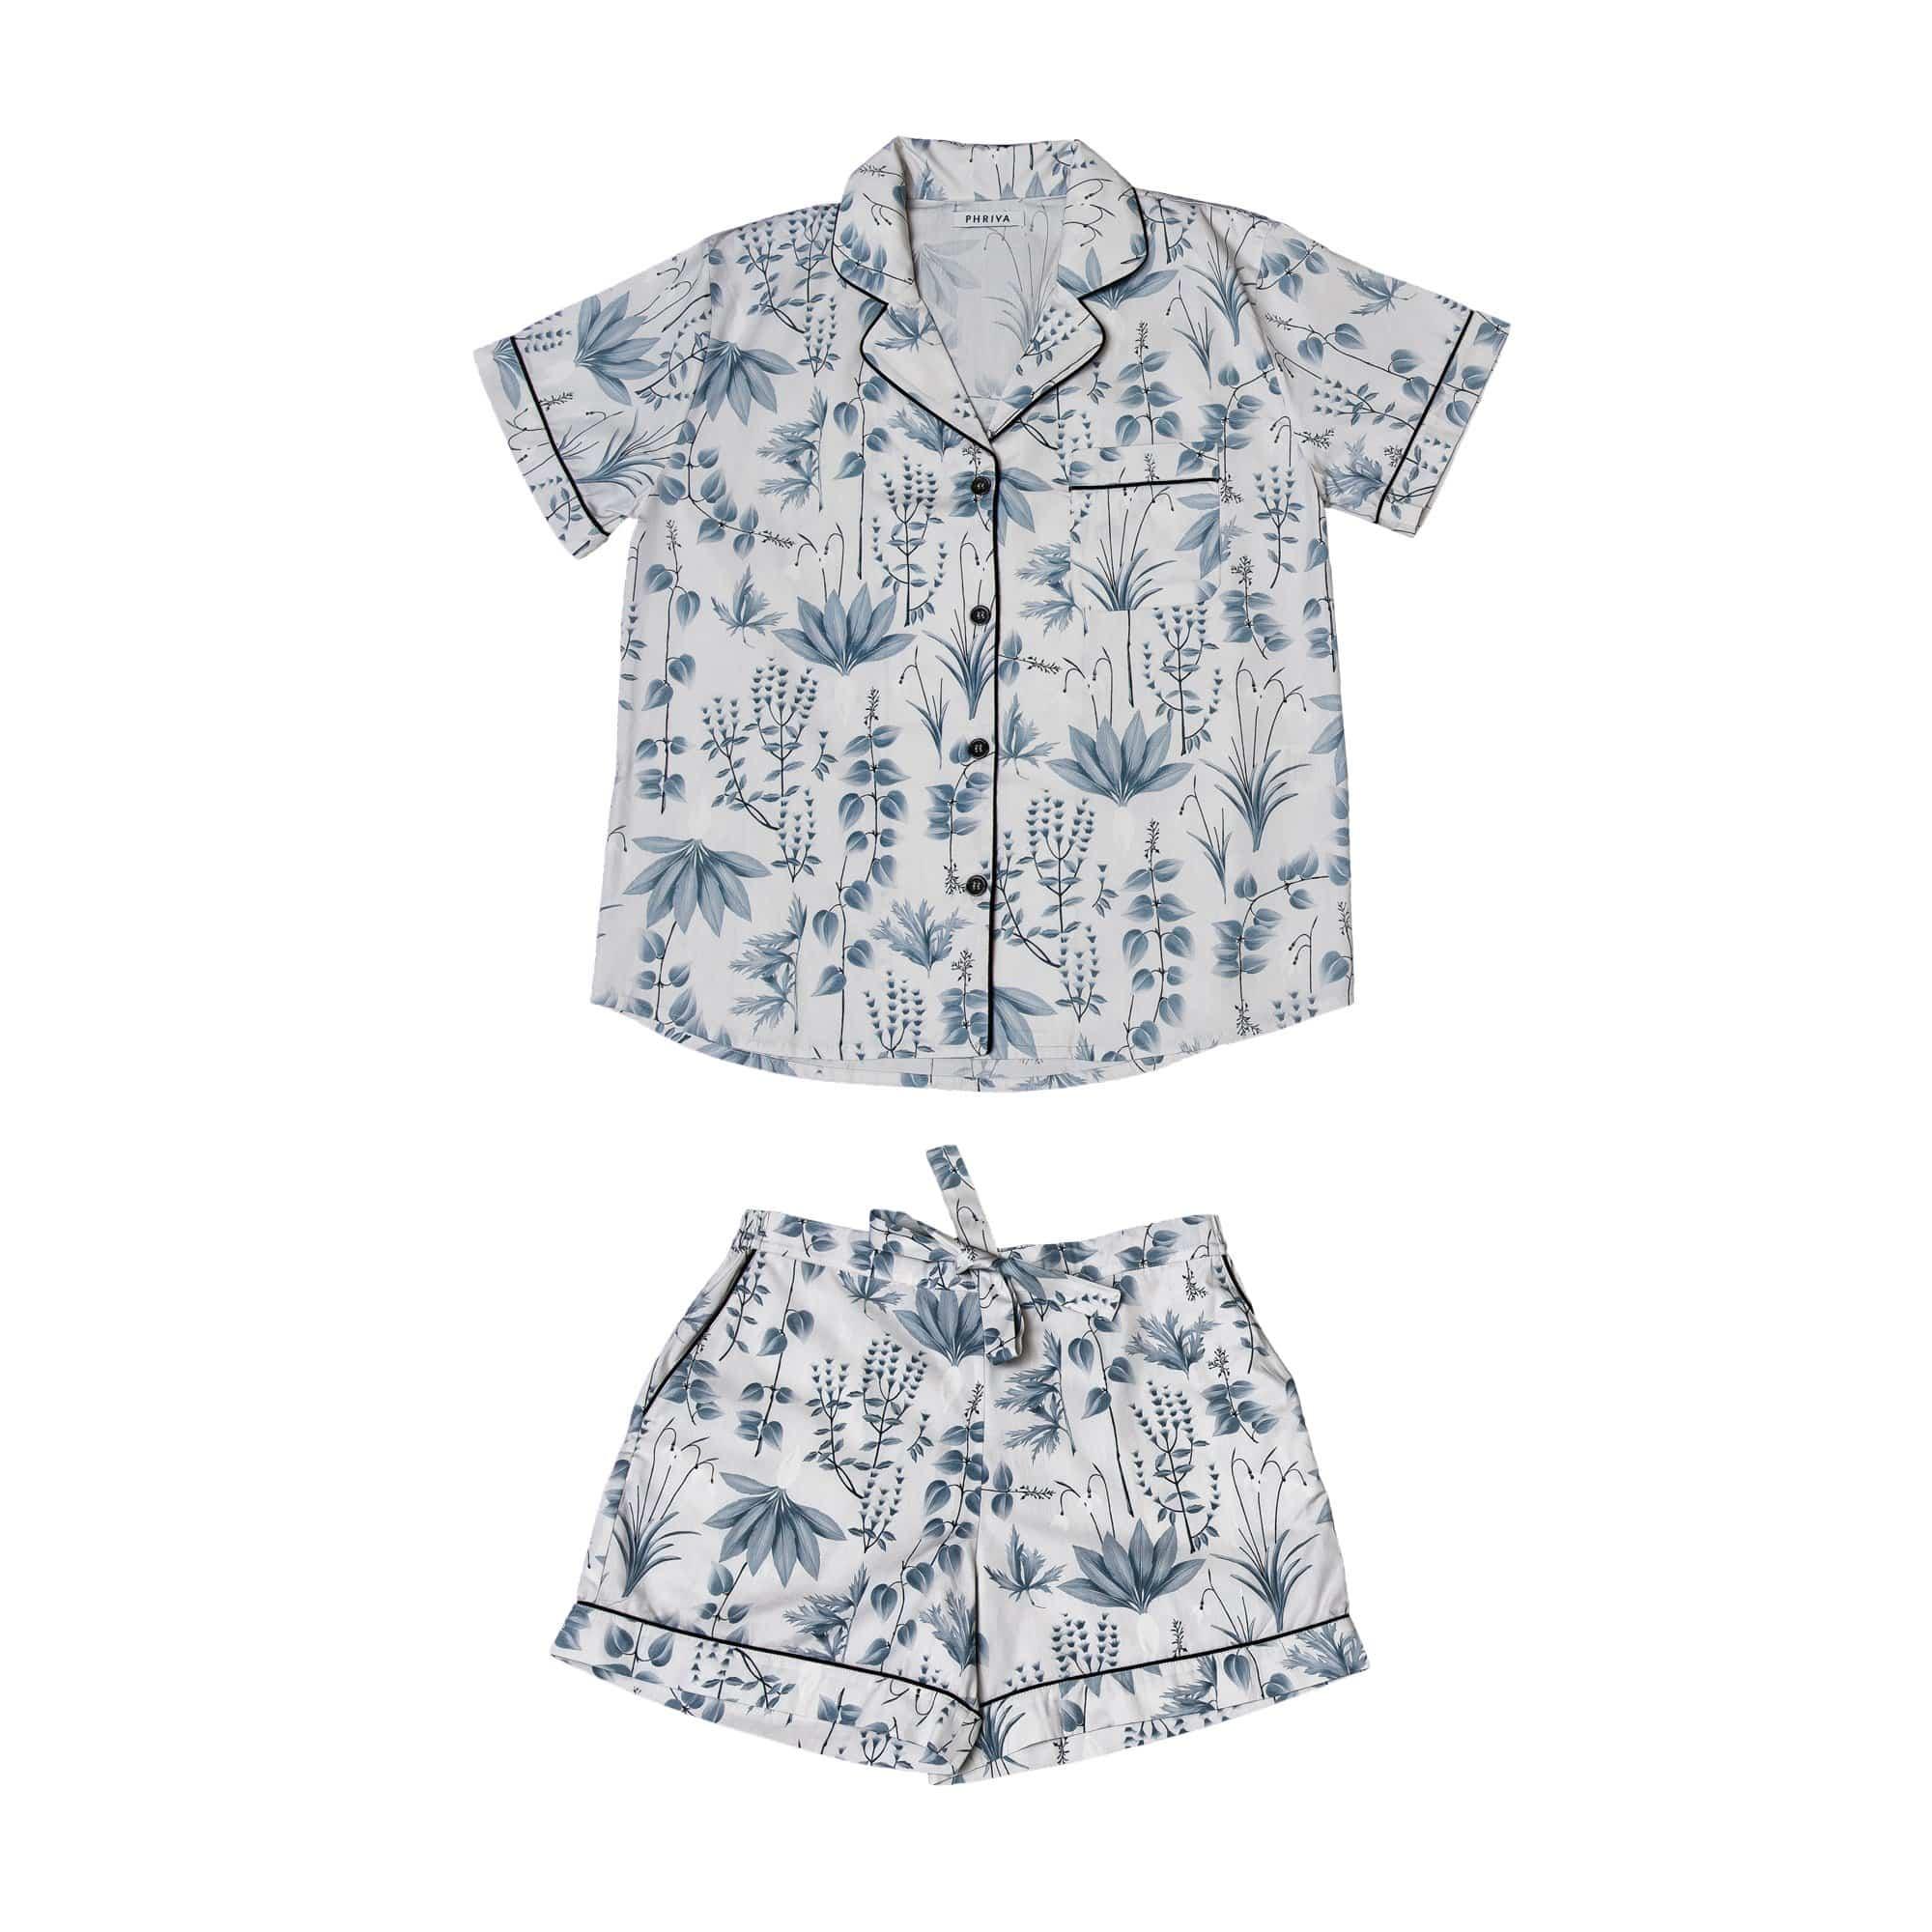 Phriya Women's Gray Circe's Garden Short Pajama Set  - multicolor - Size: One Size